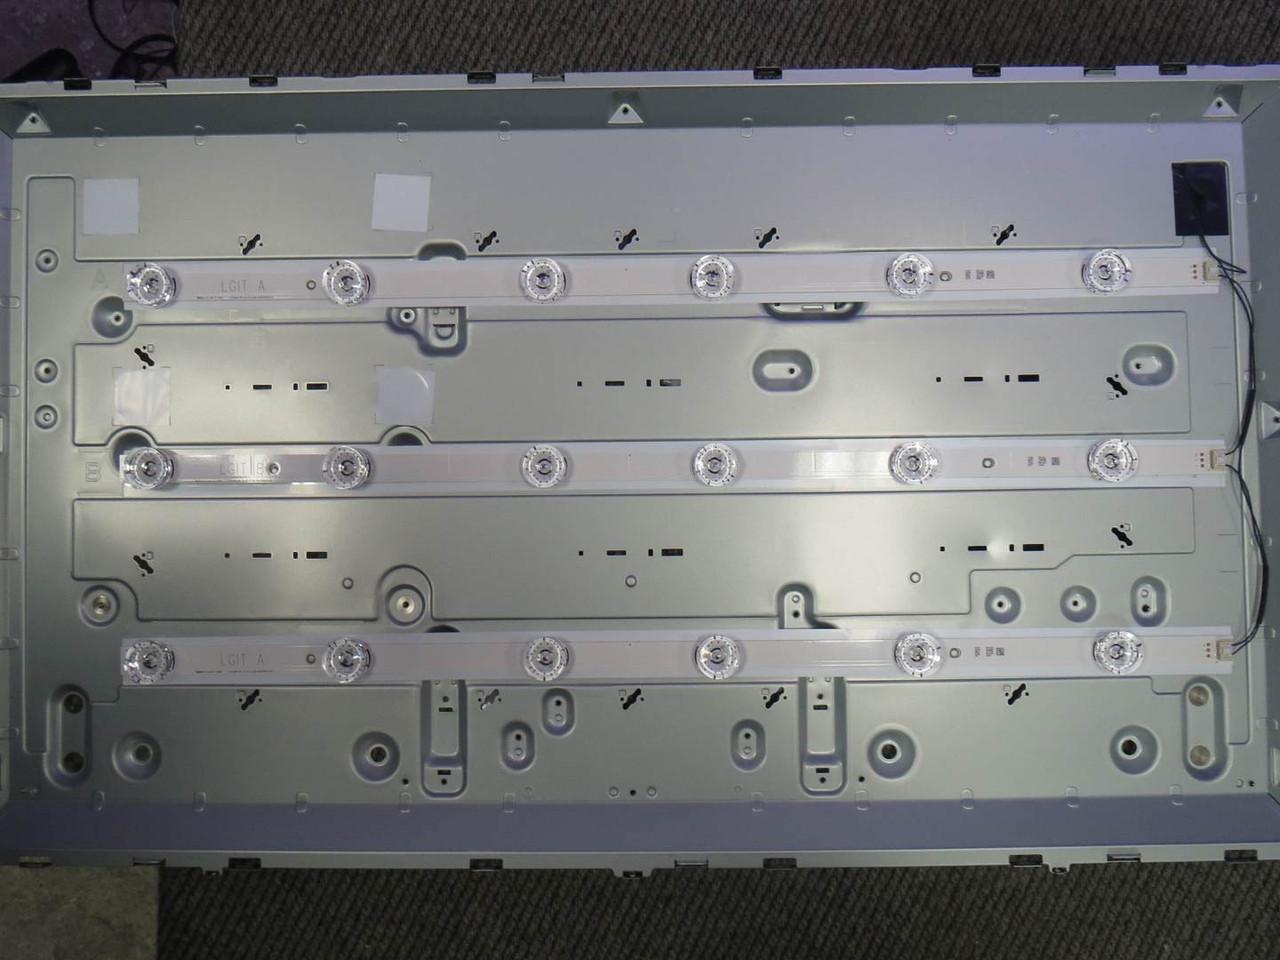 "Подсветка телевизора Innotek DRT 3.0 32""_A type Rev02 и Innotek DRT 3.0 32""_B type Rev02 для LG 32"" 32LB 32LF"